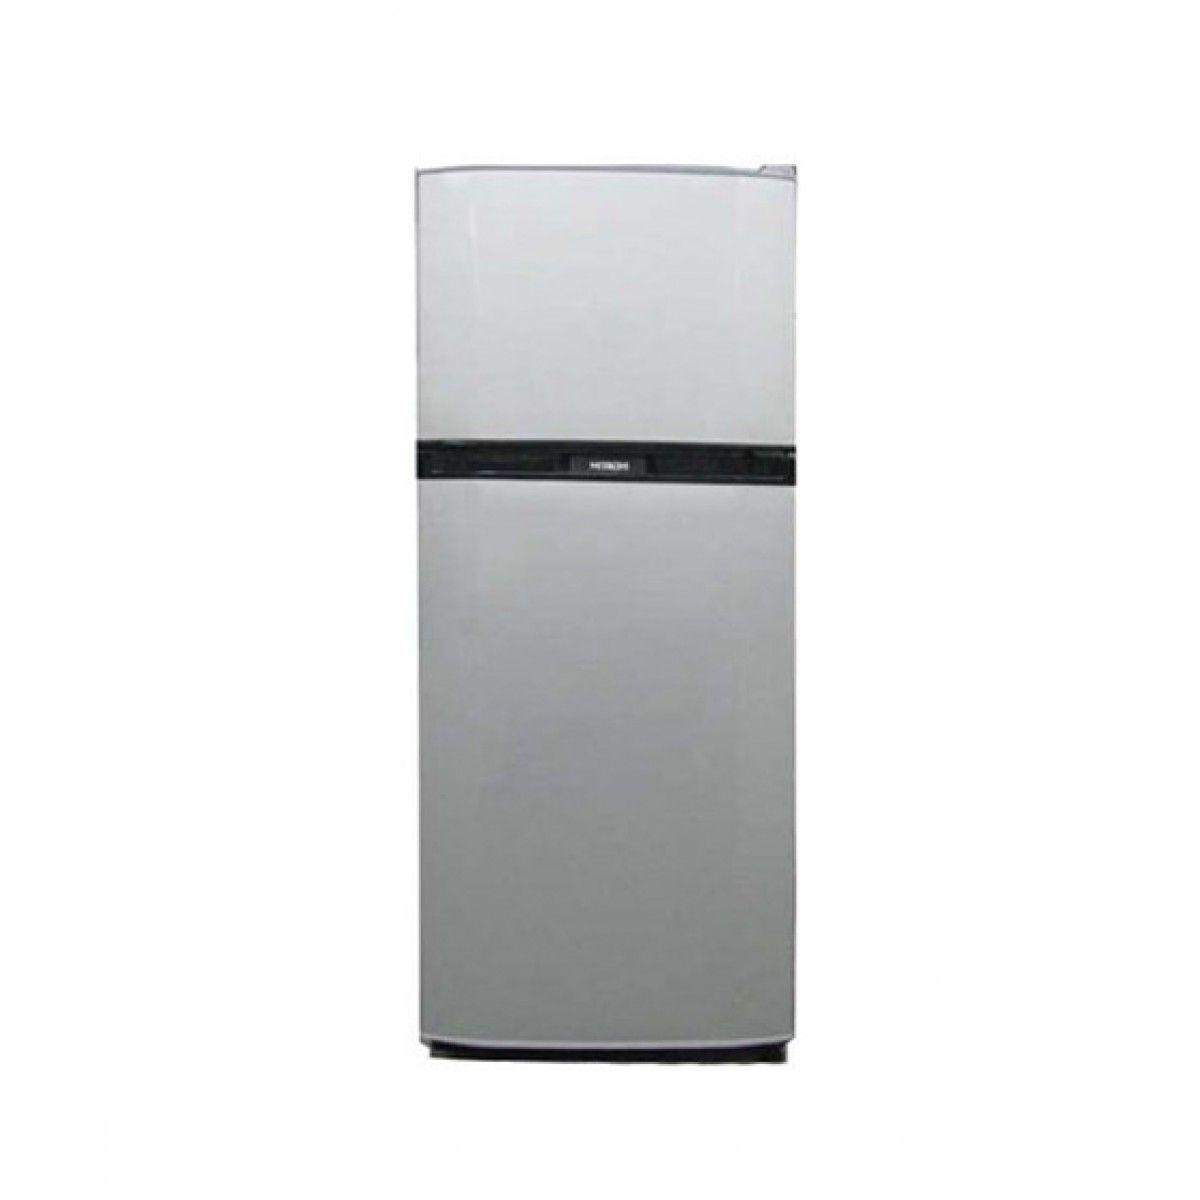 Hitachi (R-T17EG4) Freezer-on-Top Refrigerator